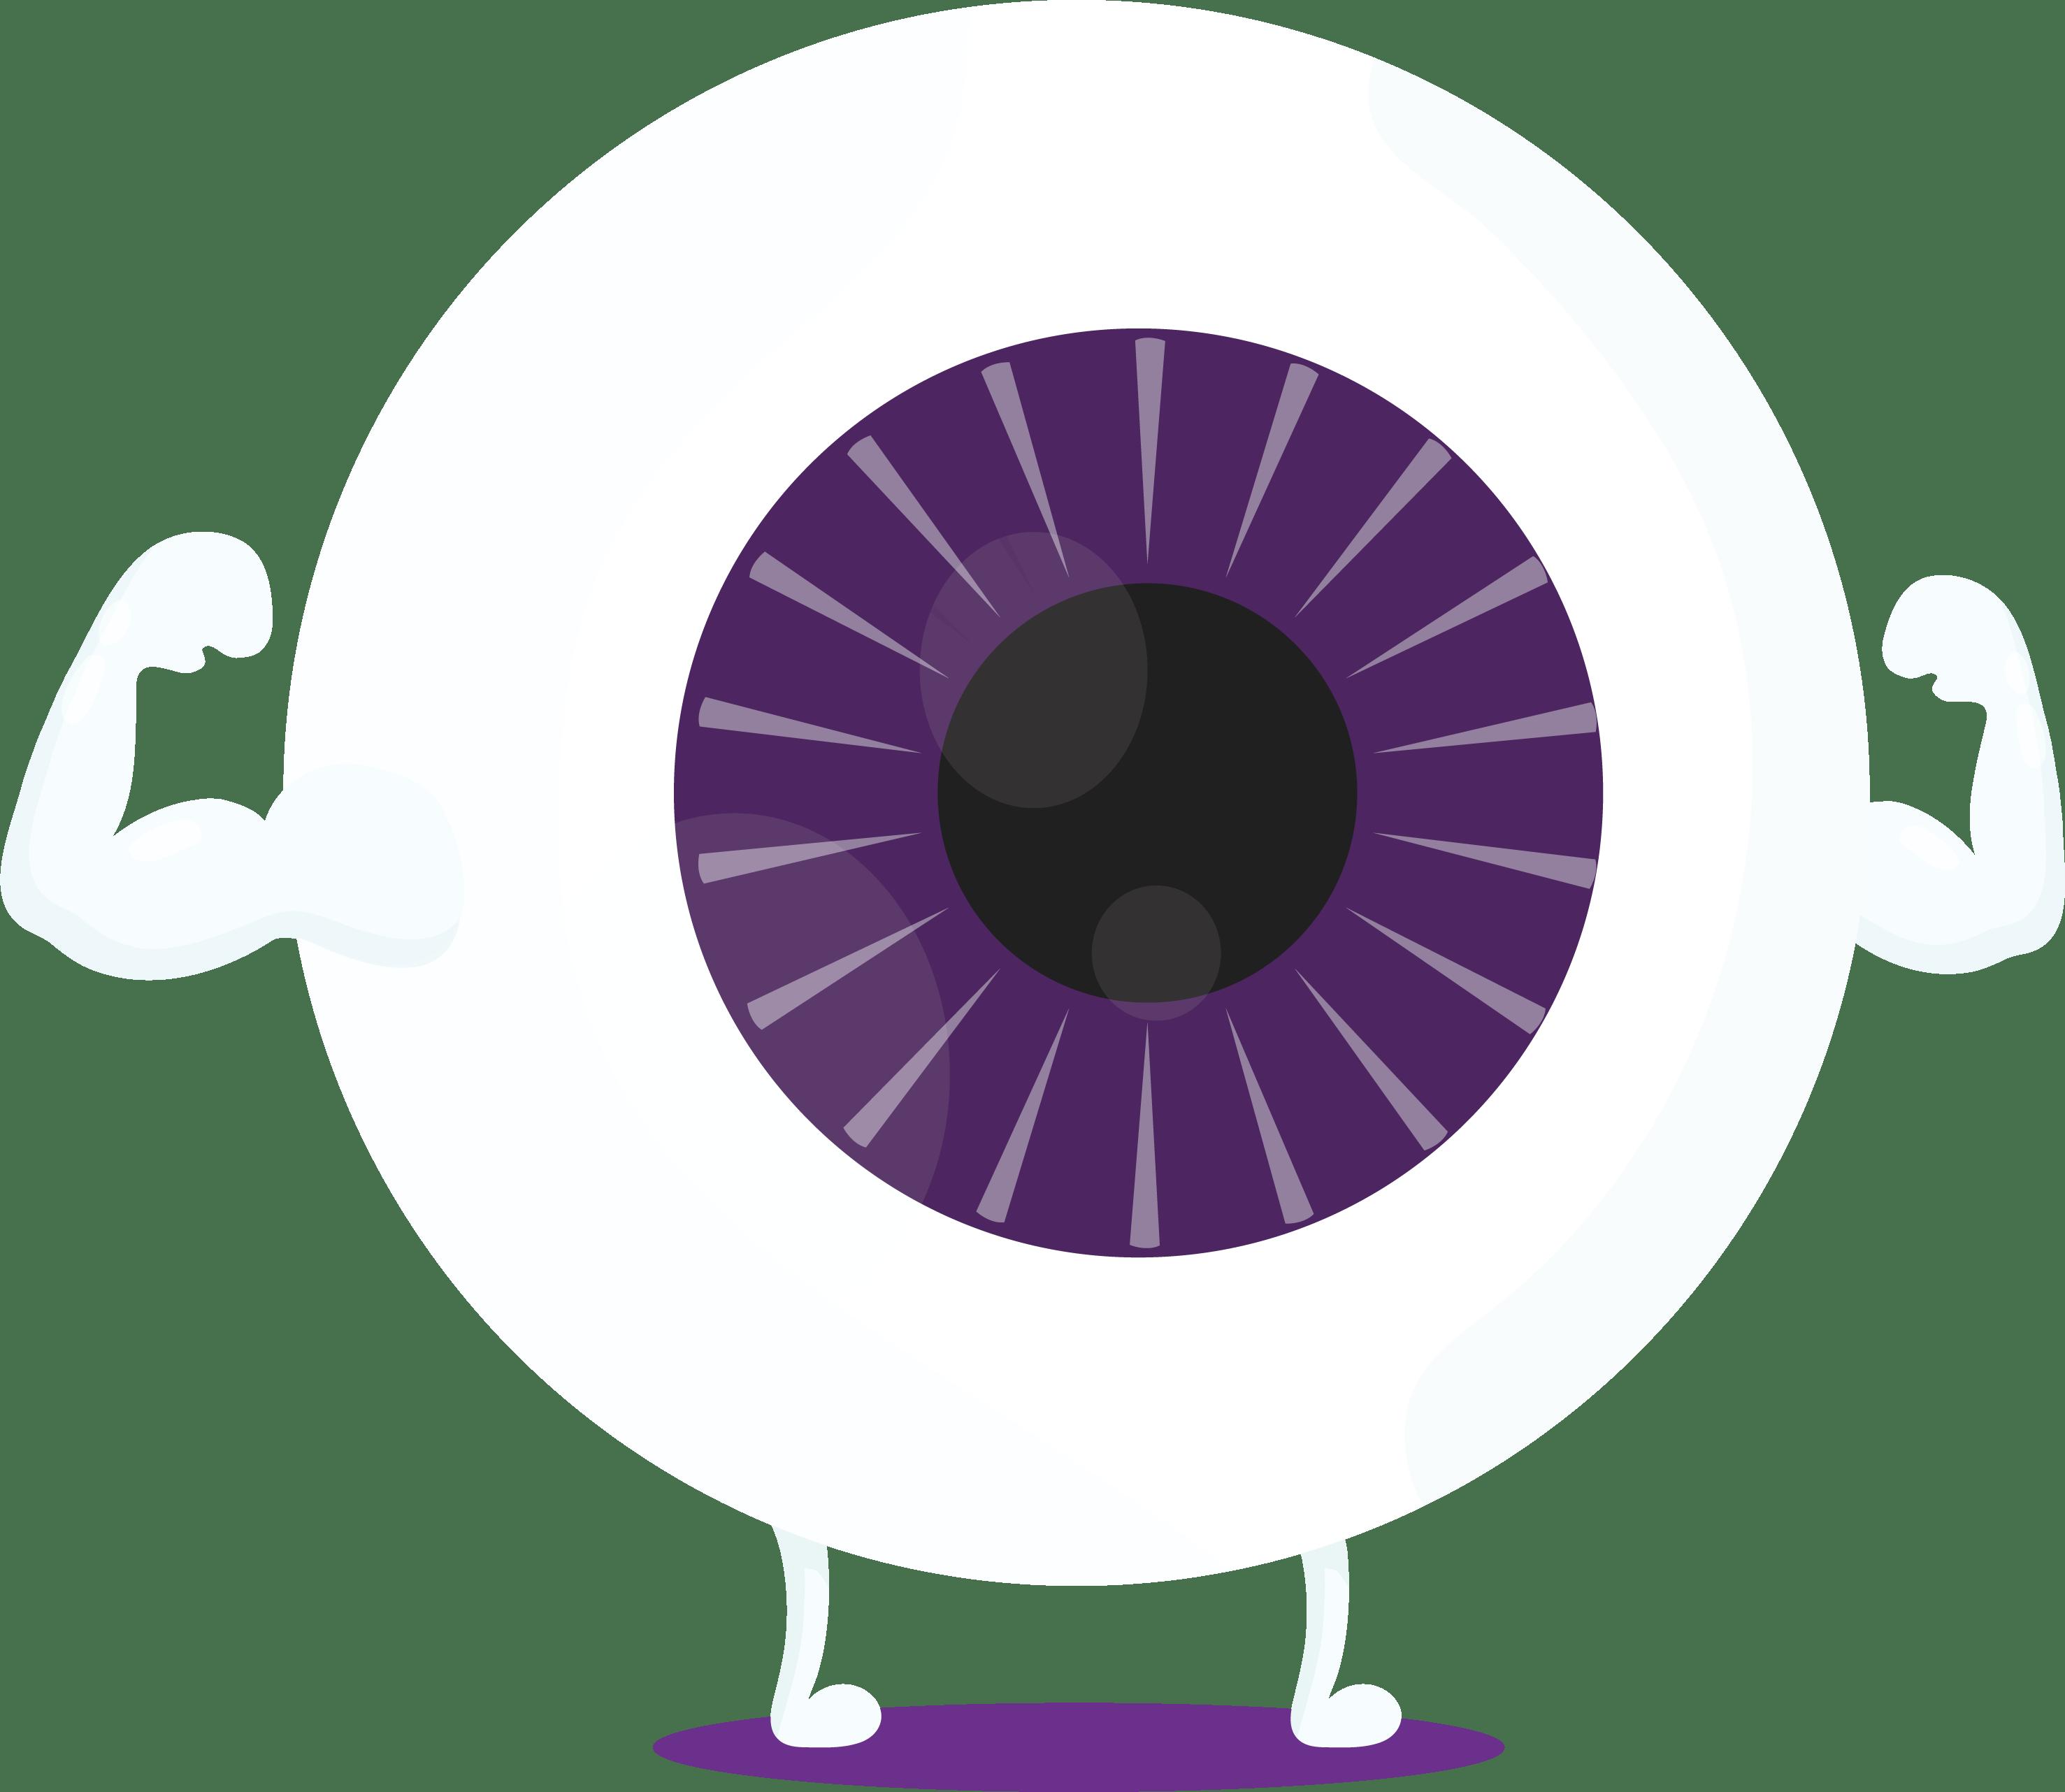 Total Optical - Eye icon purple